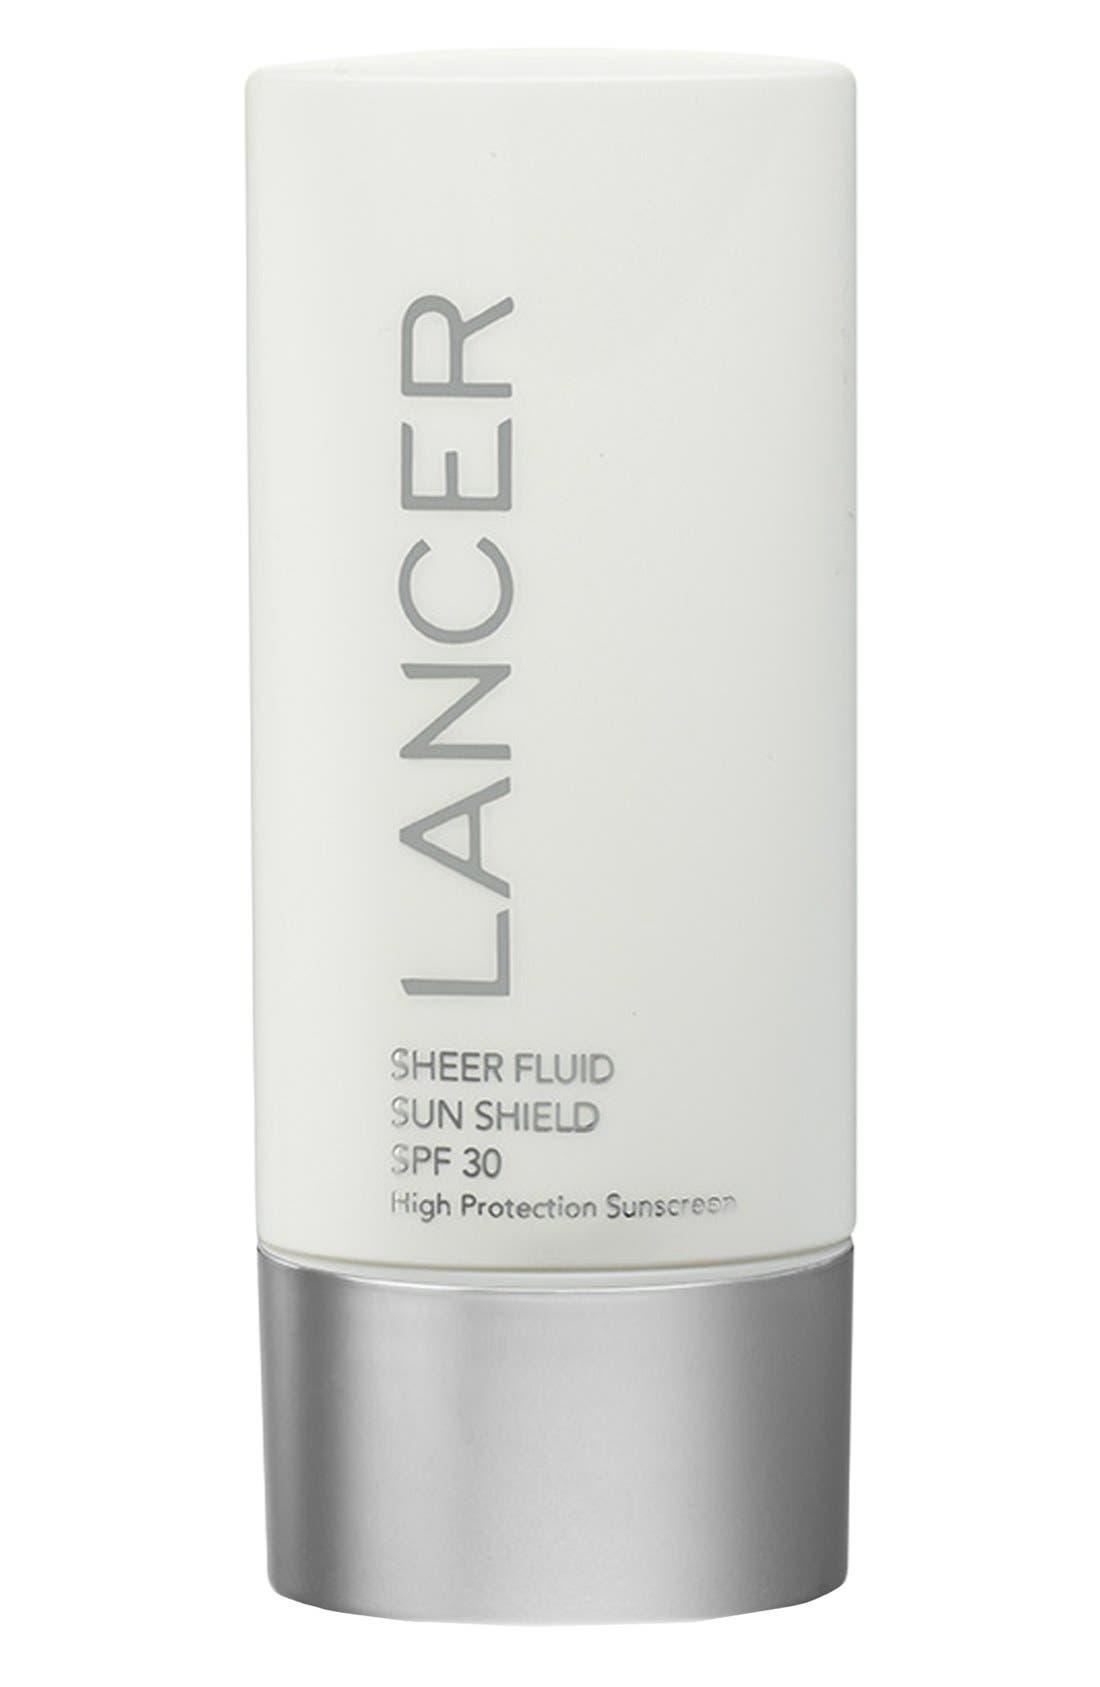 Sheer Fluid Sun Shield SPF 30,                             Main thumbnail 1, color,                             NO COLOR